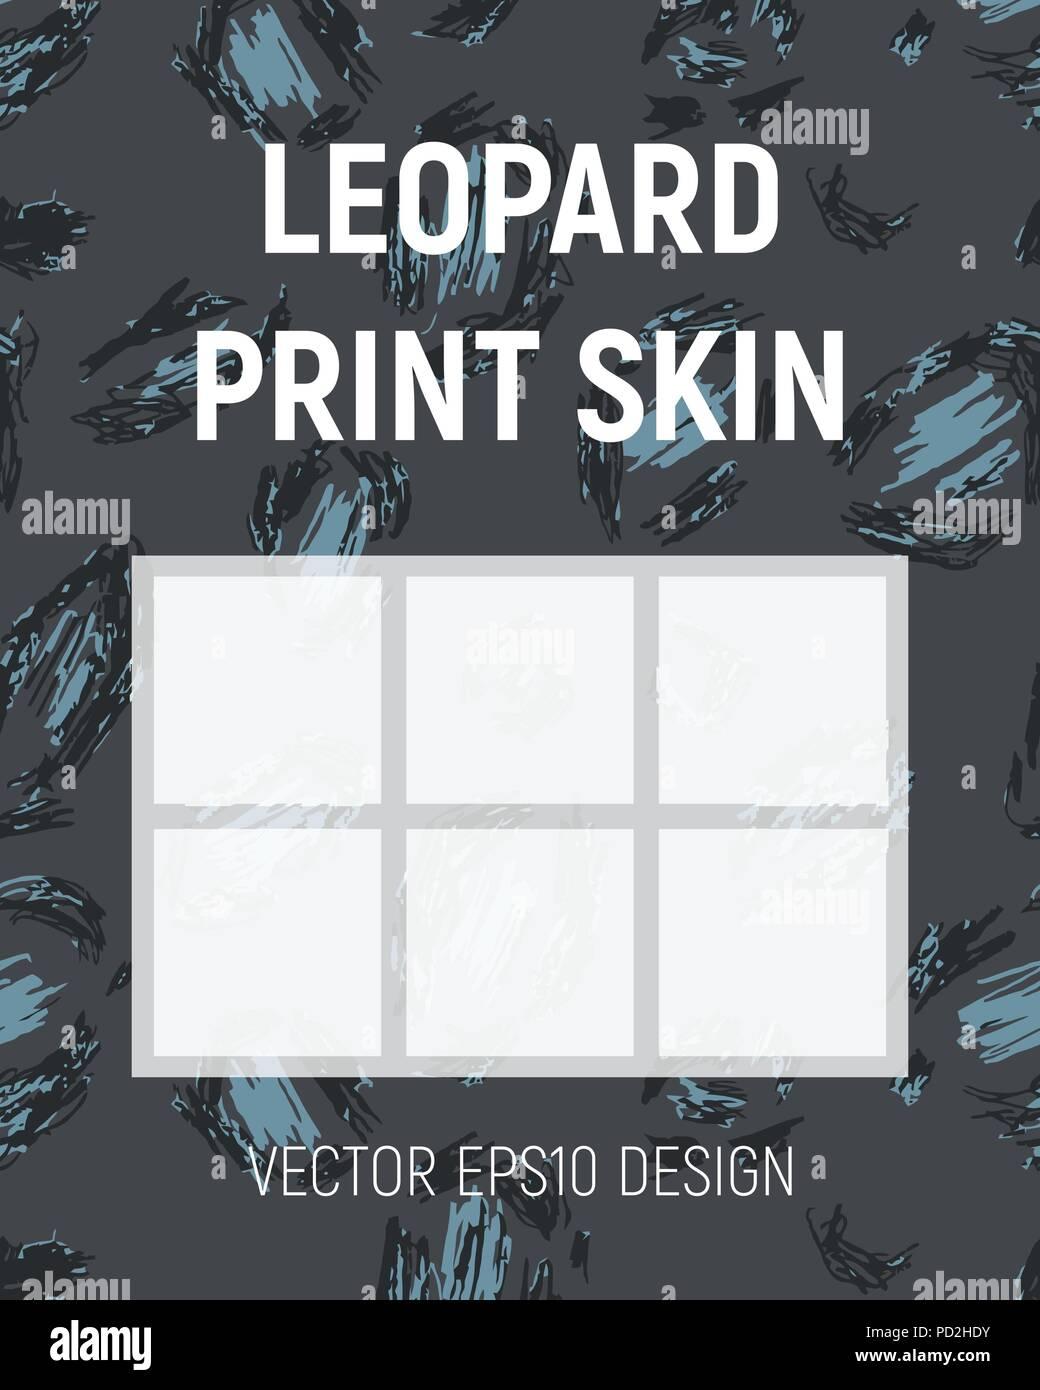 Blue leopard print skin. Brochure template. Vector illustration. - Stock Vector